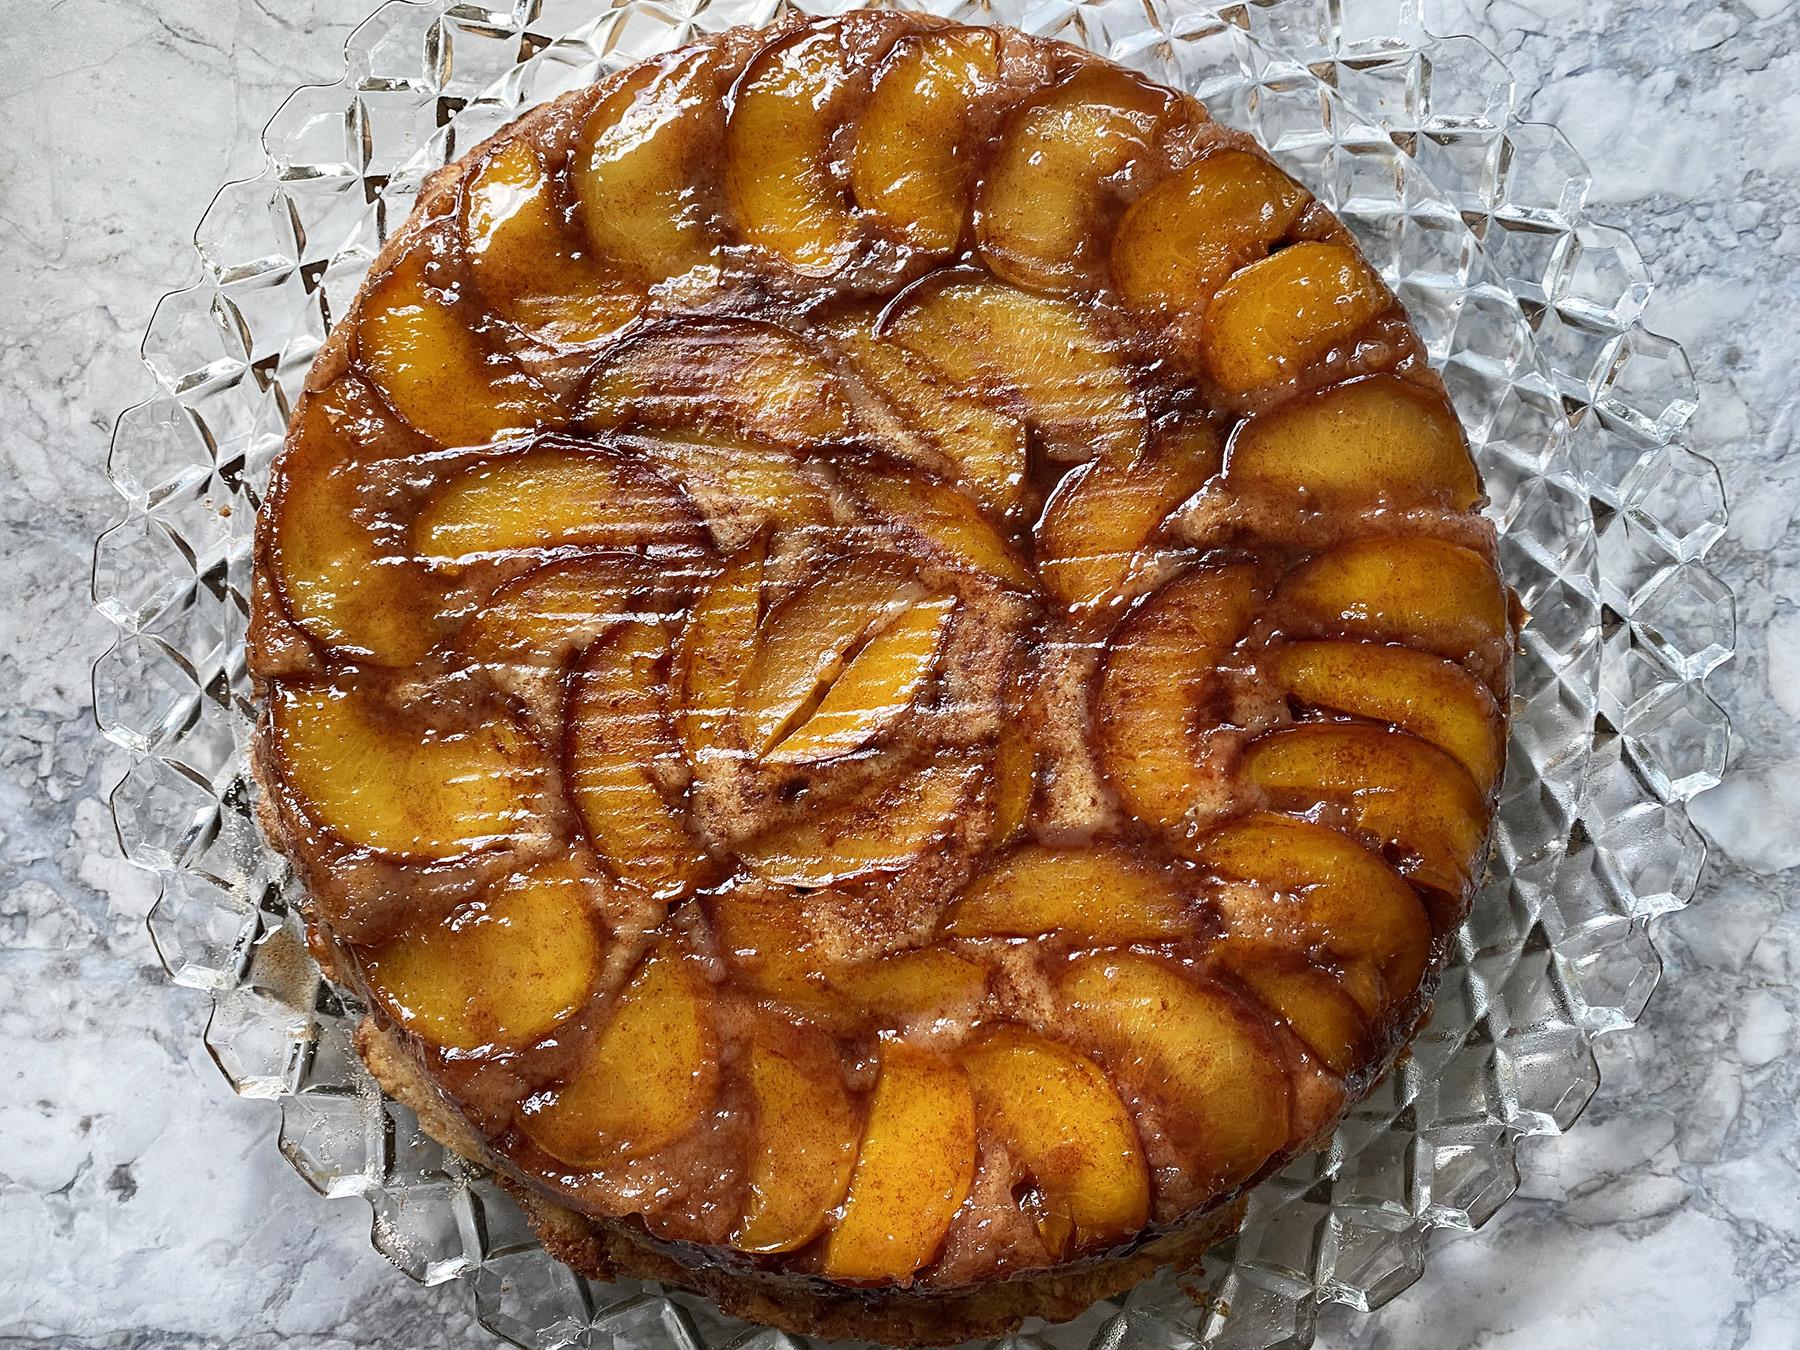 Cinnamon Sugar Peach Upside Down Skillet Cake